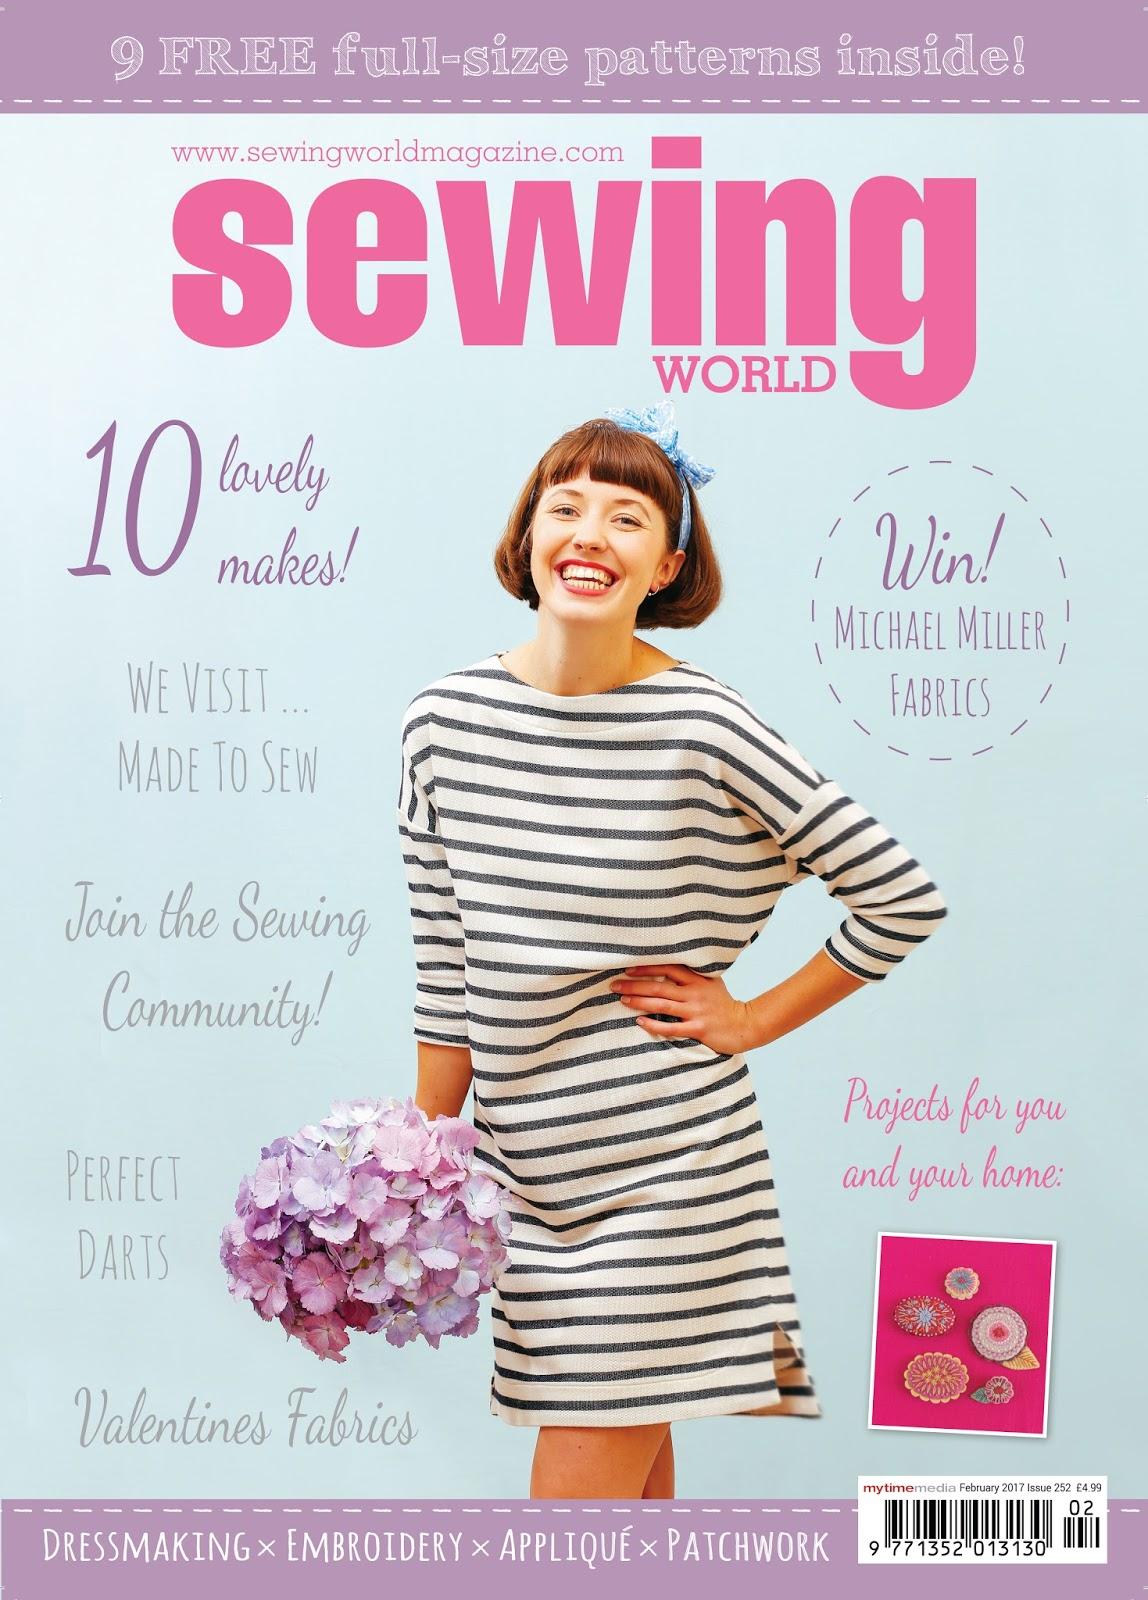 Sewforsoul valentines applique wall hanging pattern sewing world magazine february 2017 jeuxipadfo Choice Image